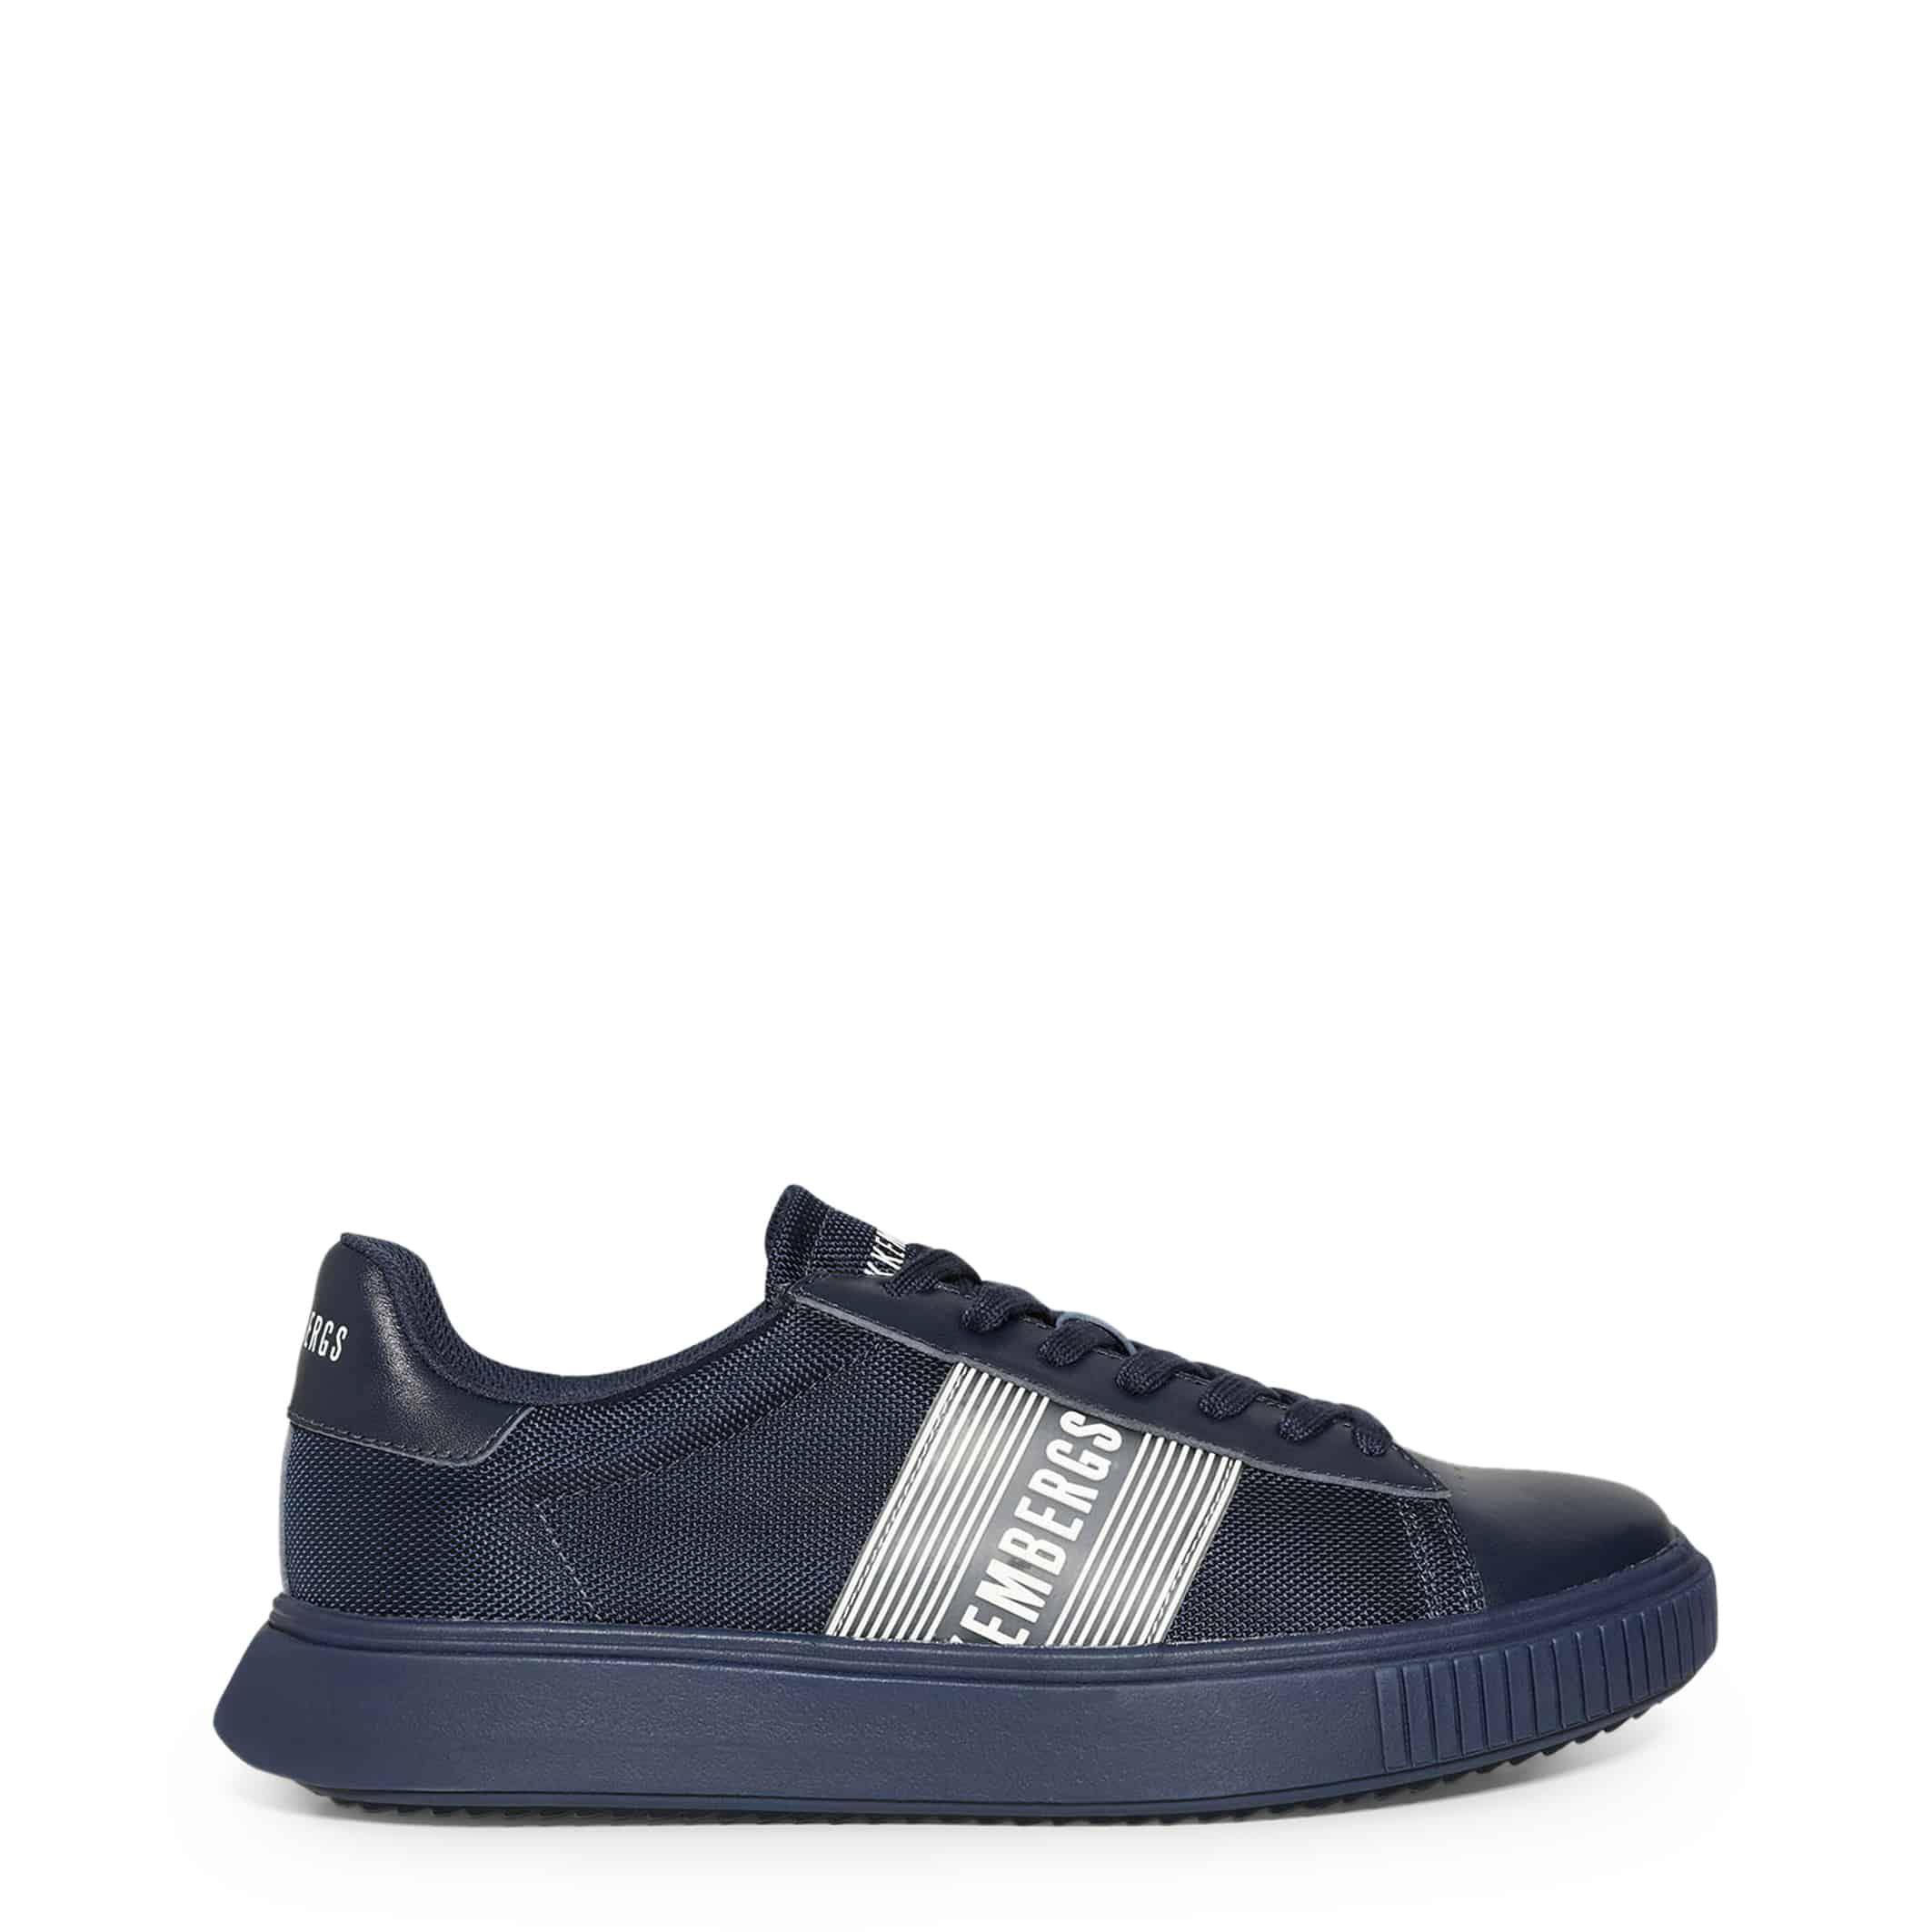 Sneakers Bikkembergs – B4BKM0027